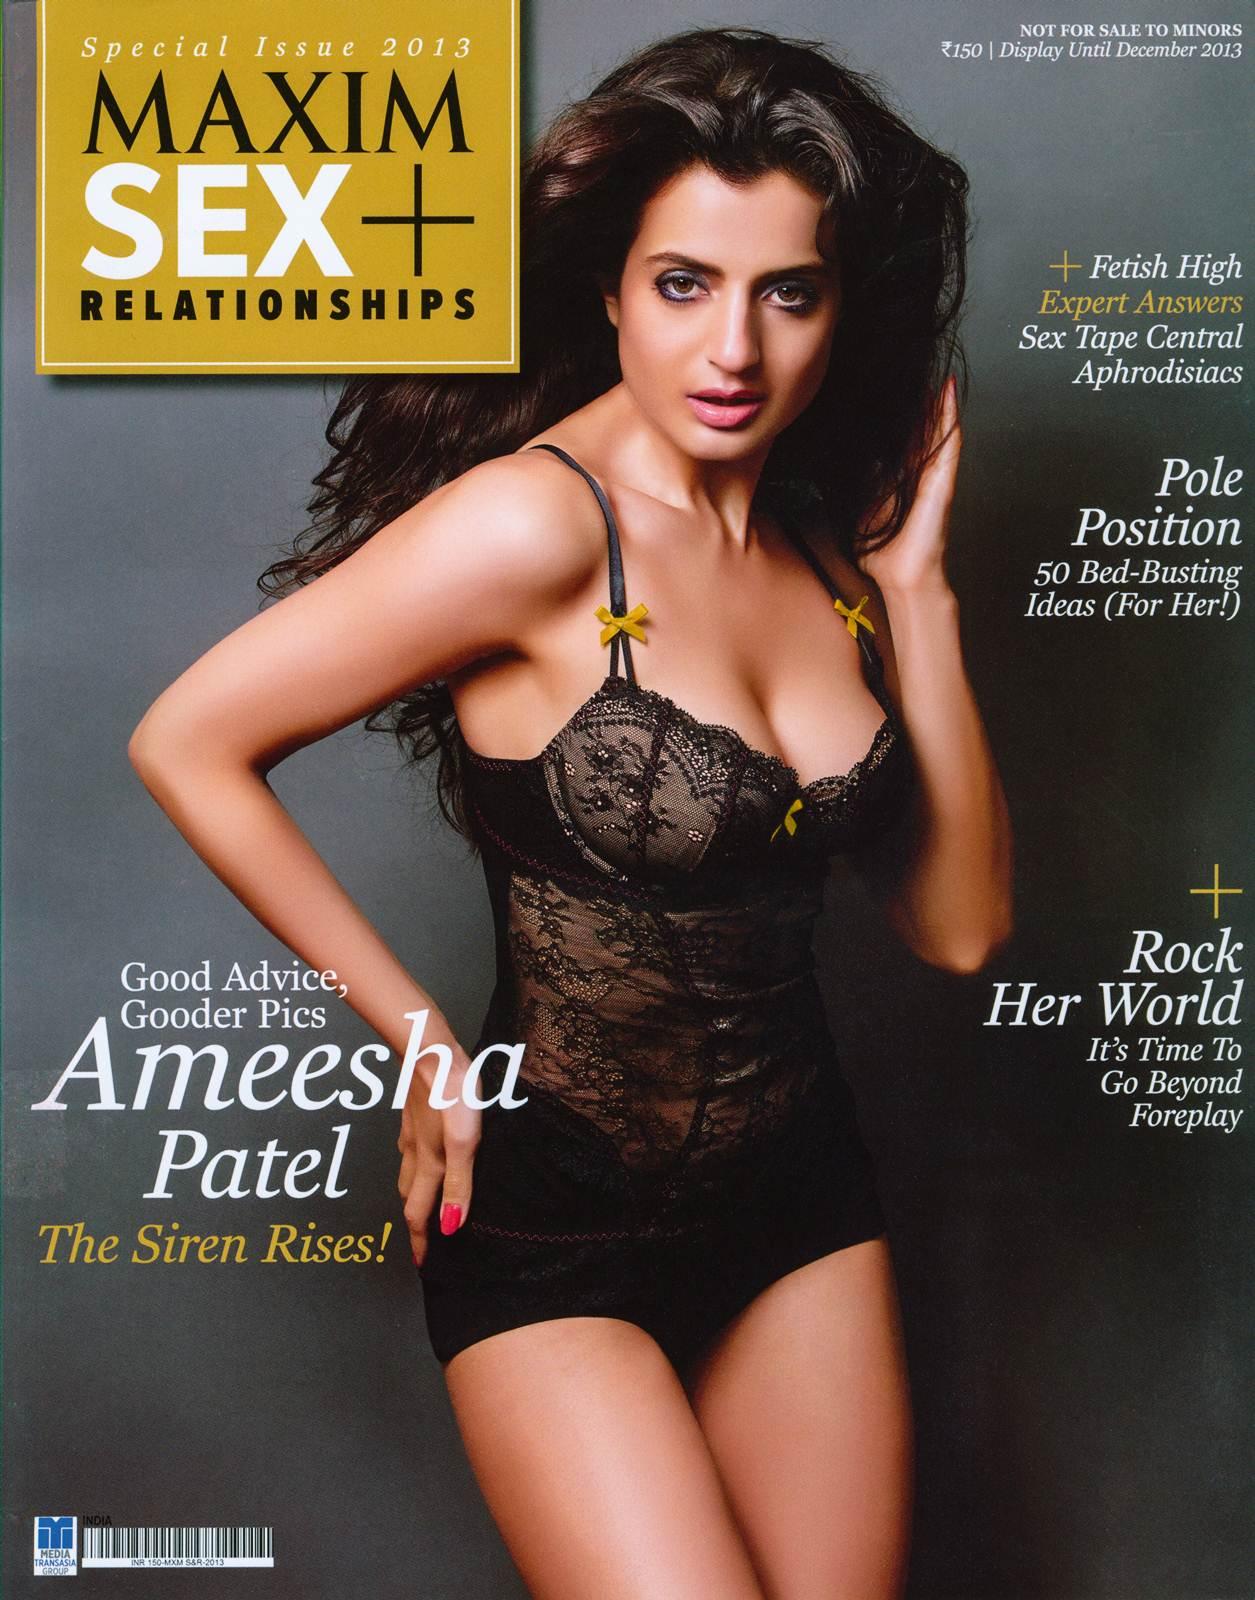 Ameesha patel in maxim magazine hd wallpaper download original voltagebd Images